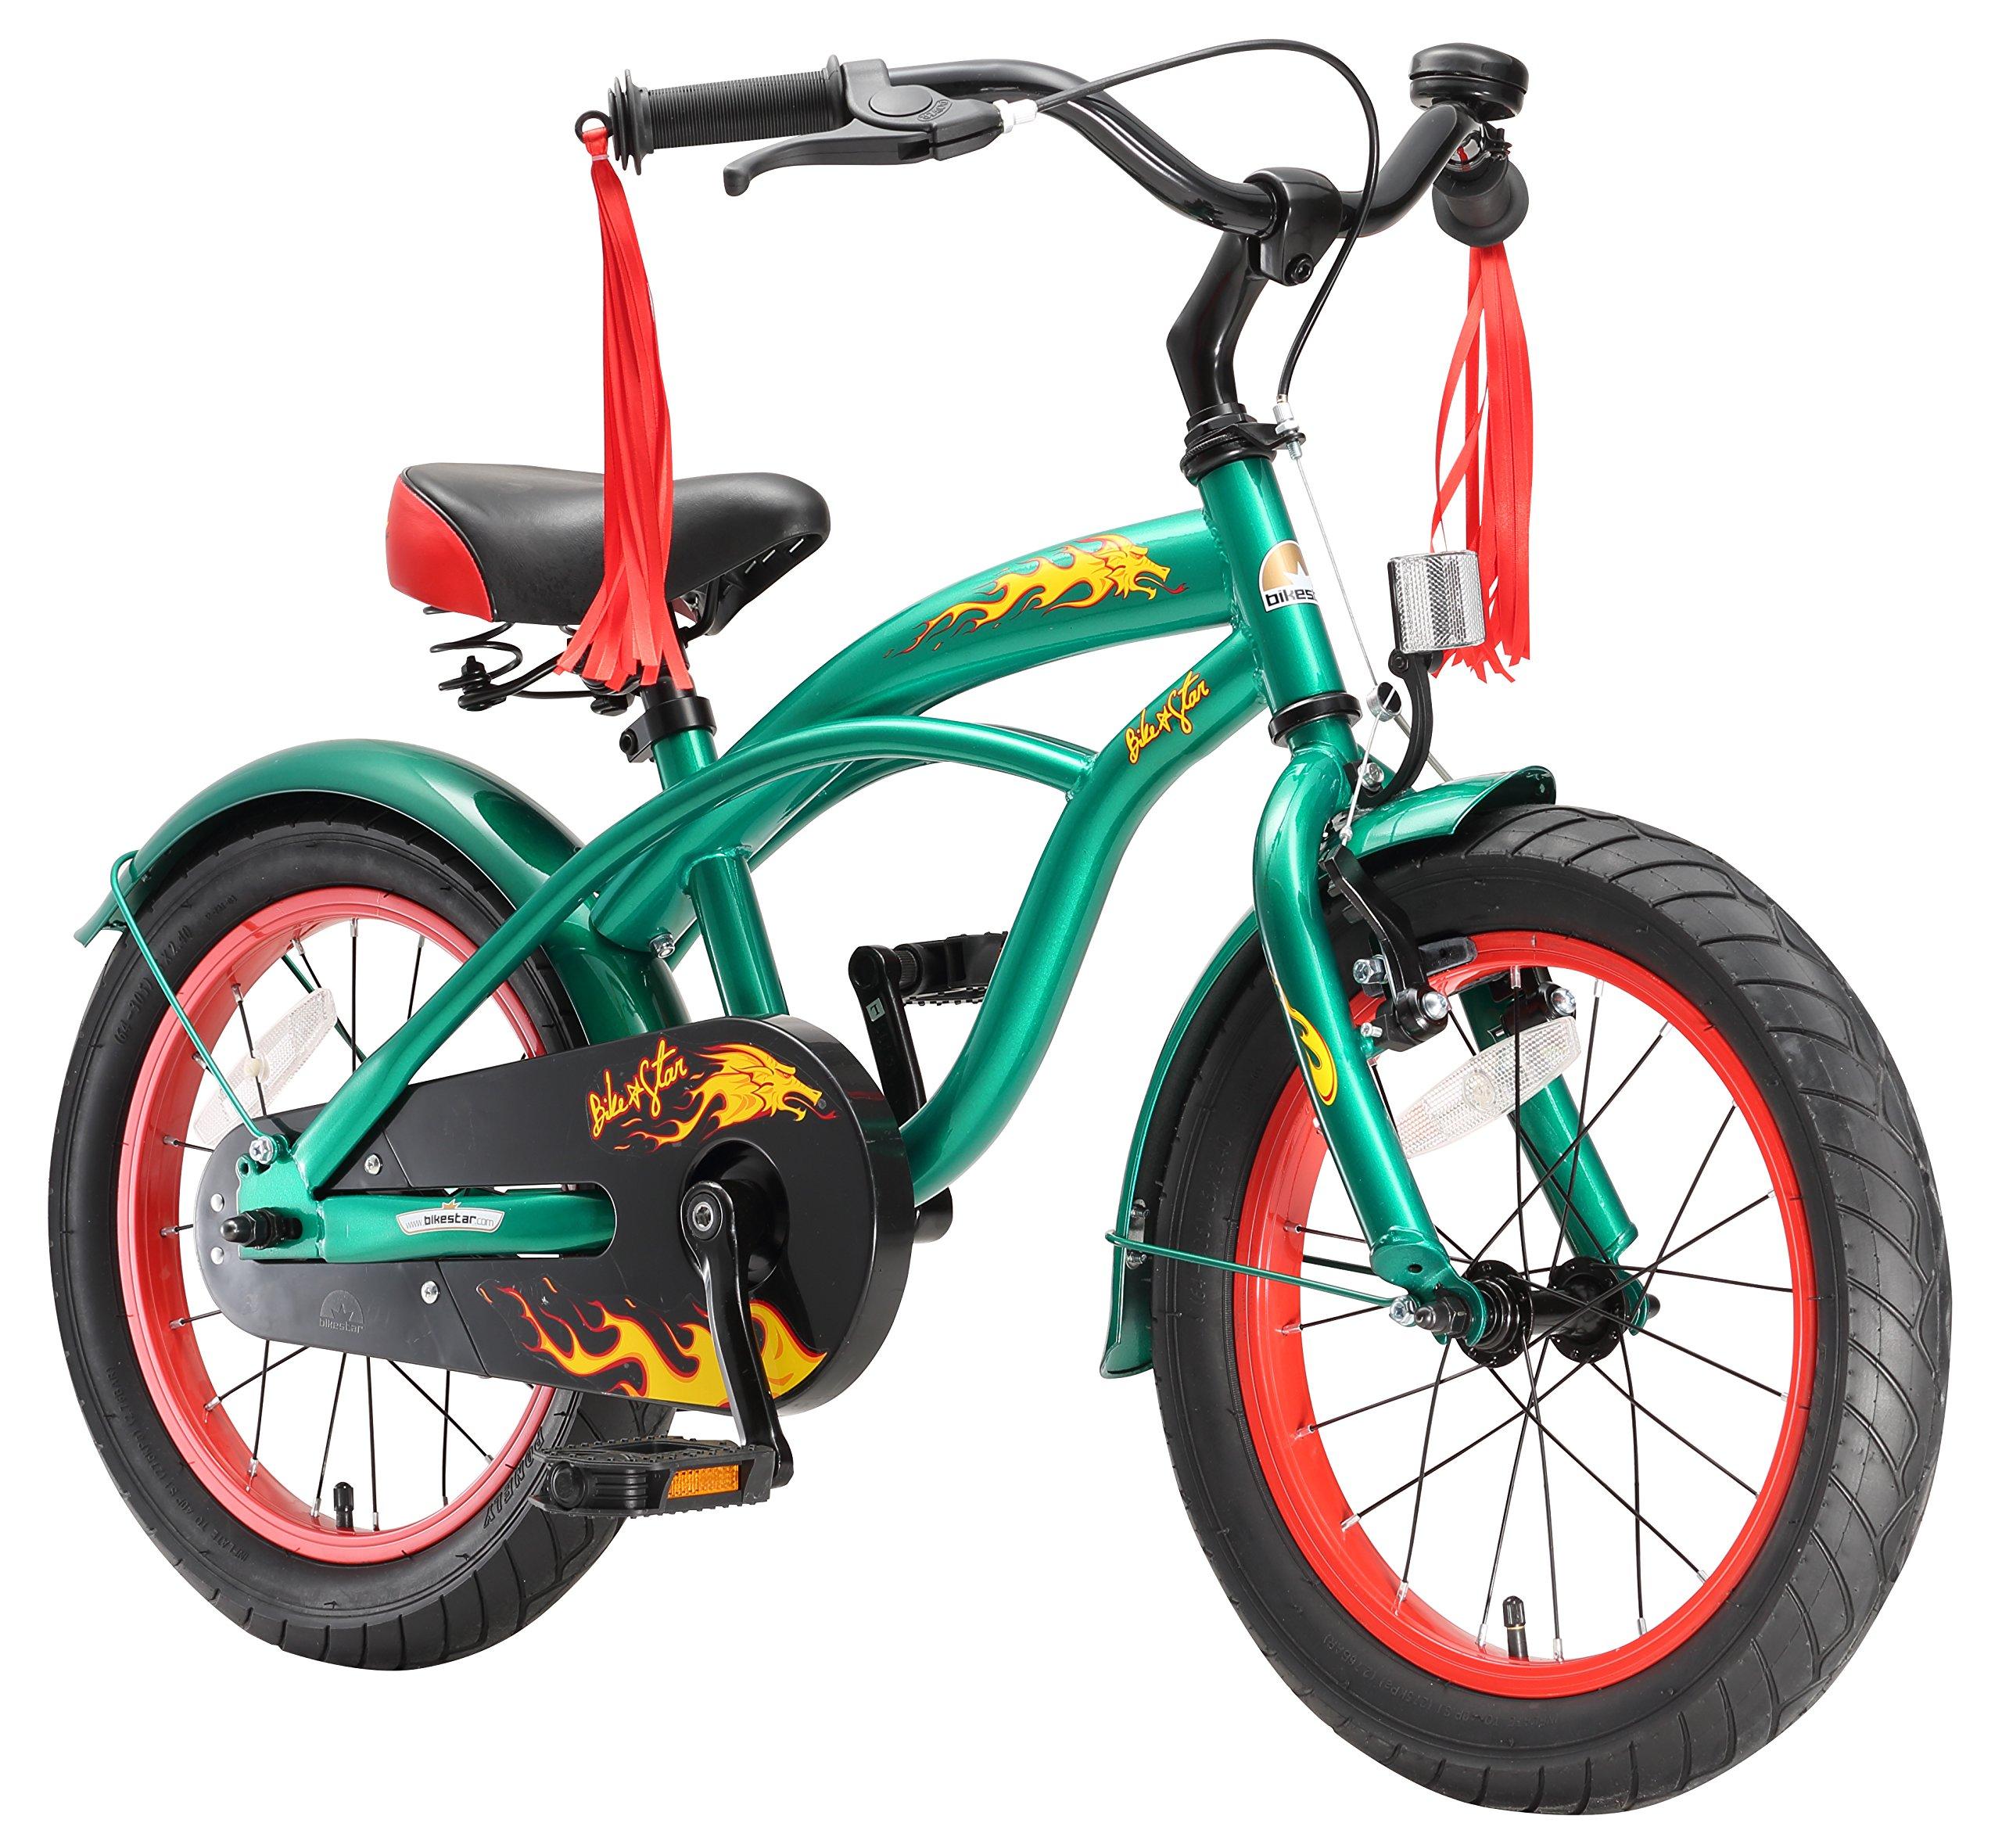 BIKESTAR® Premium 40.6cm (16 pulgada) Bicicleta Premium para los niños mas atrevidos